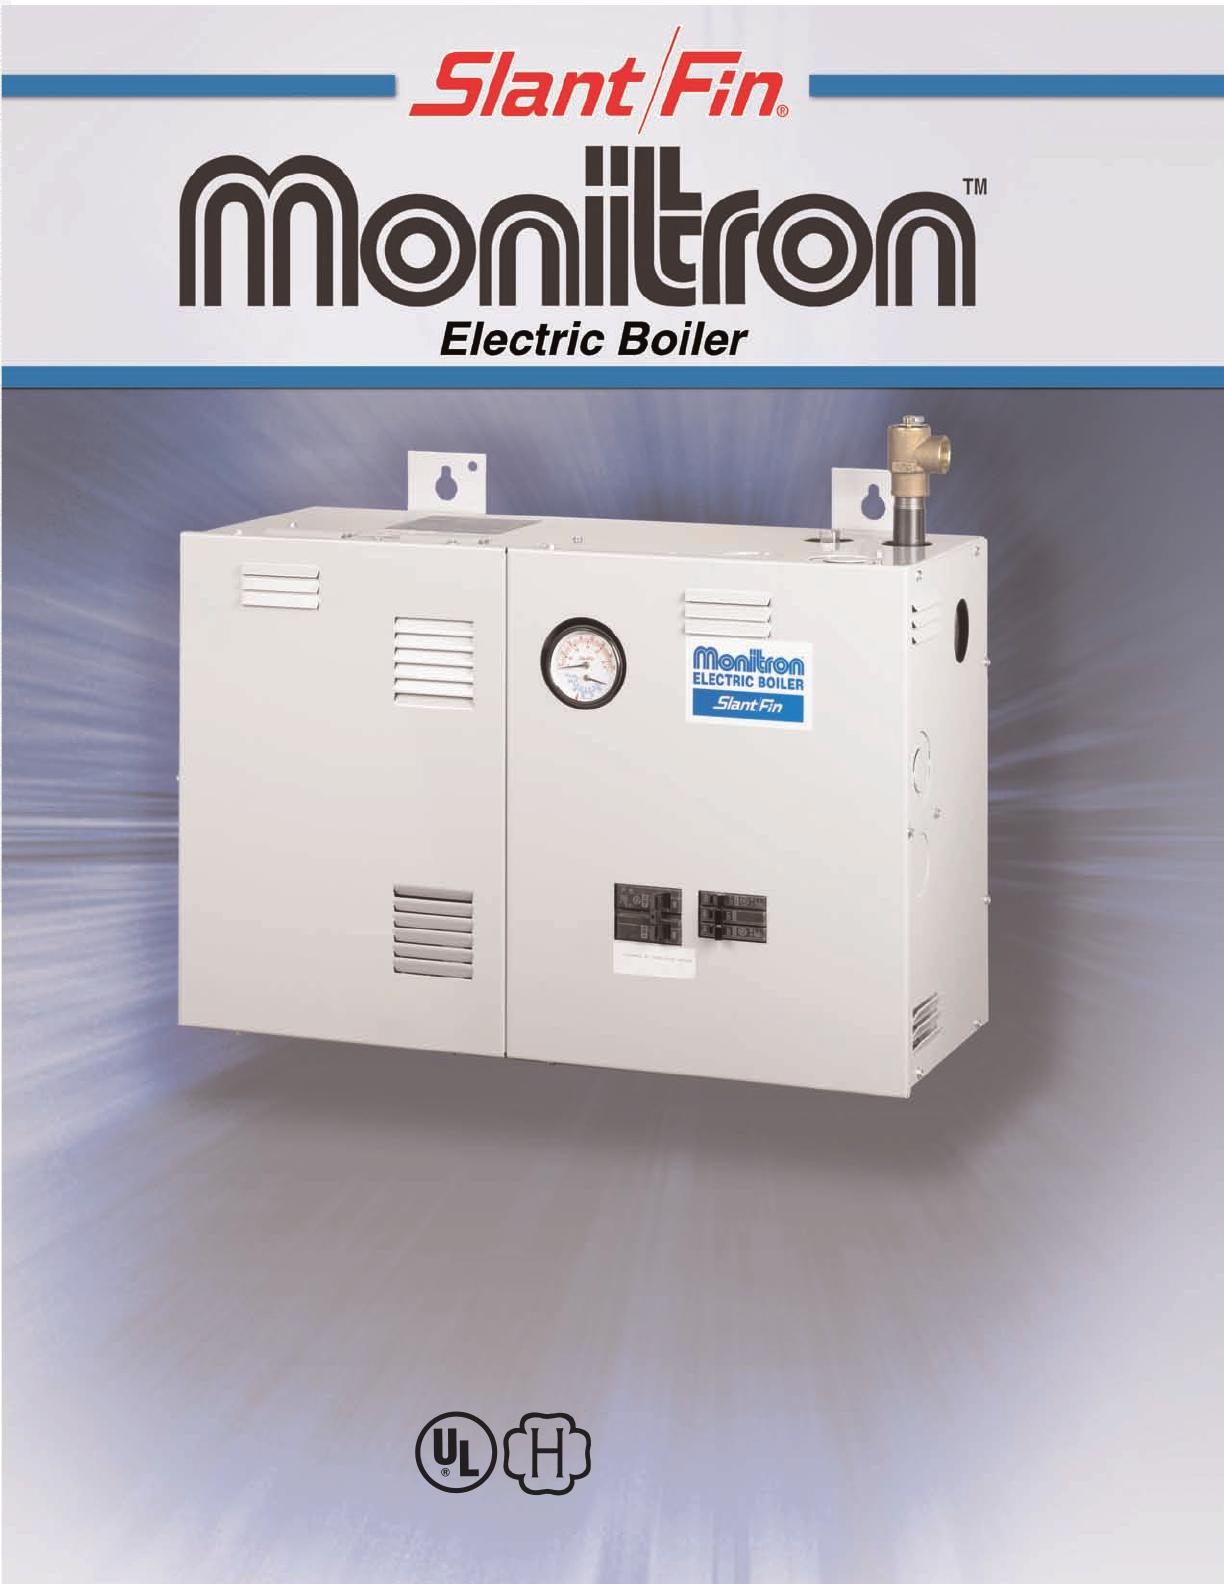 Slant Fin Monitron Eh Boilers Users Manual